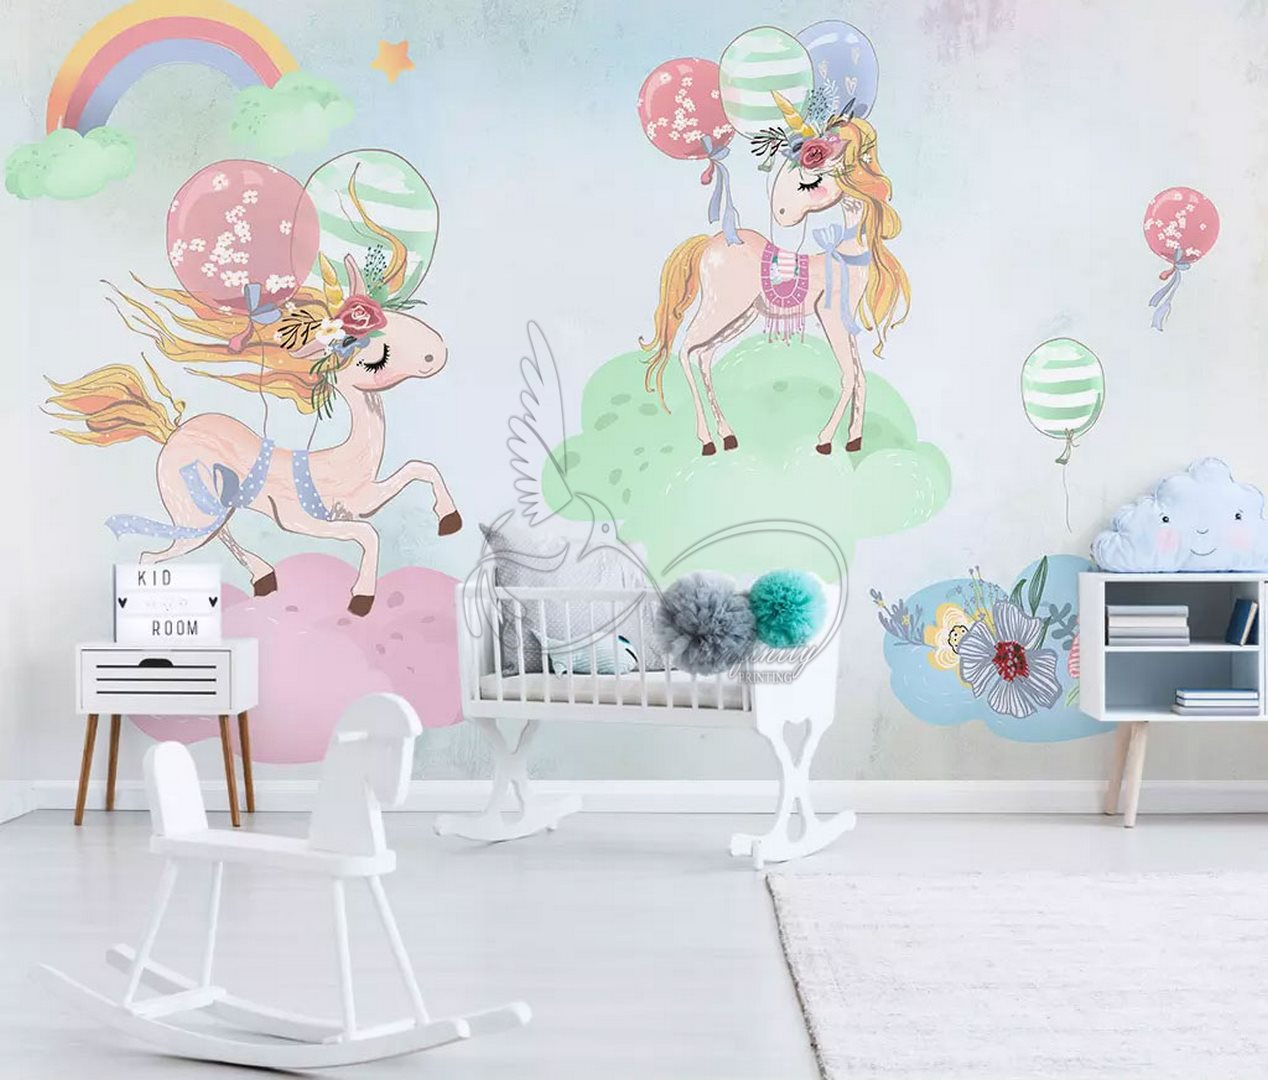 Fantasy child room design wall poster printing code 3142